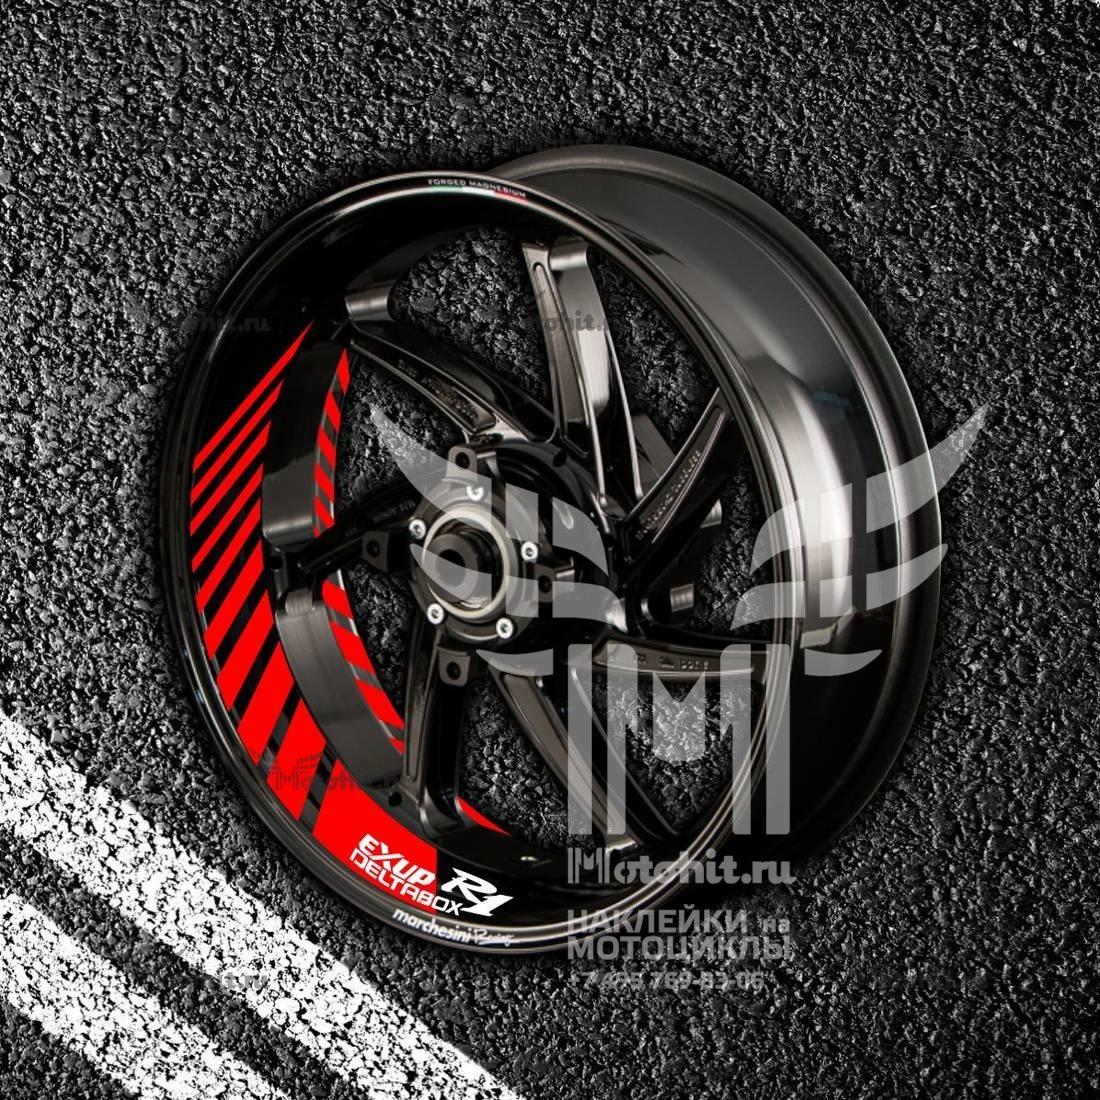 Комплект наклеек с полосами на колеса мотоцикла YAMAHA EXUP-DELTABOX-R1